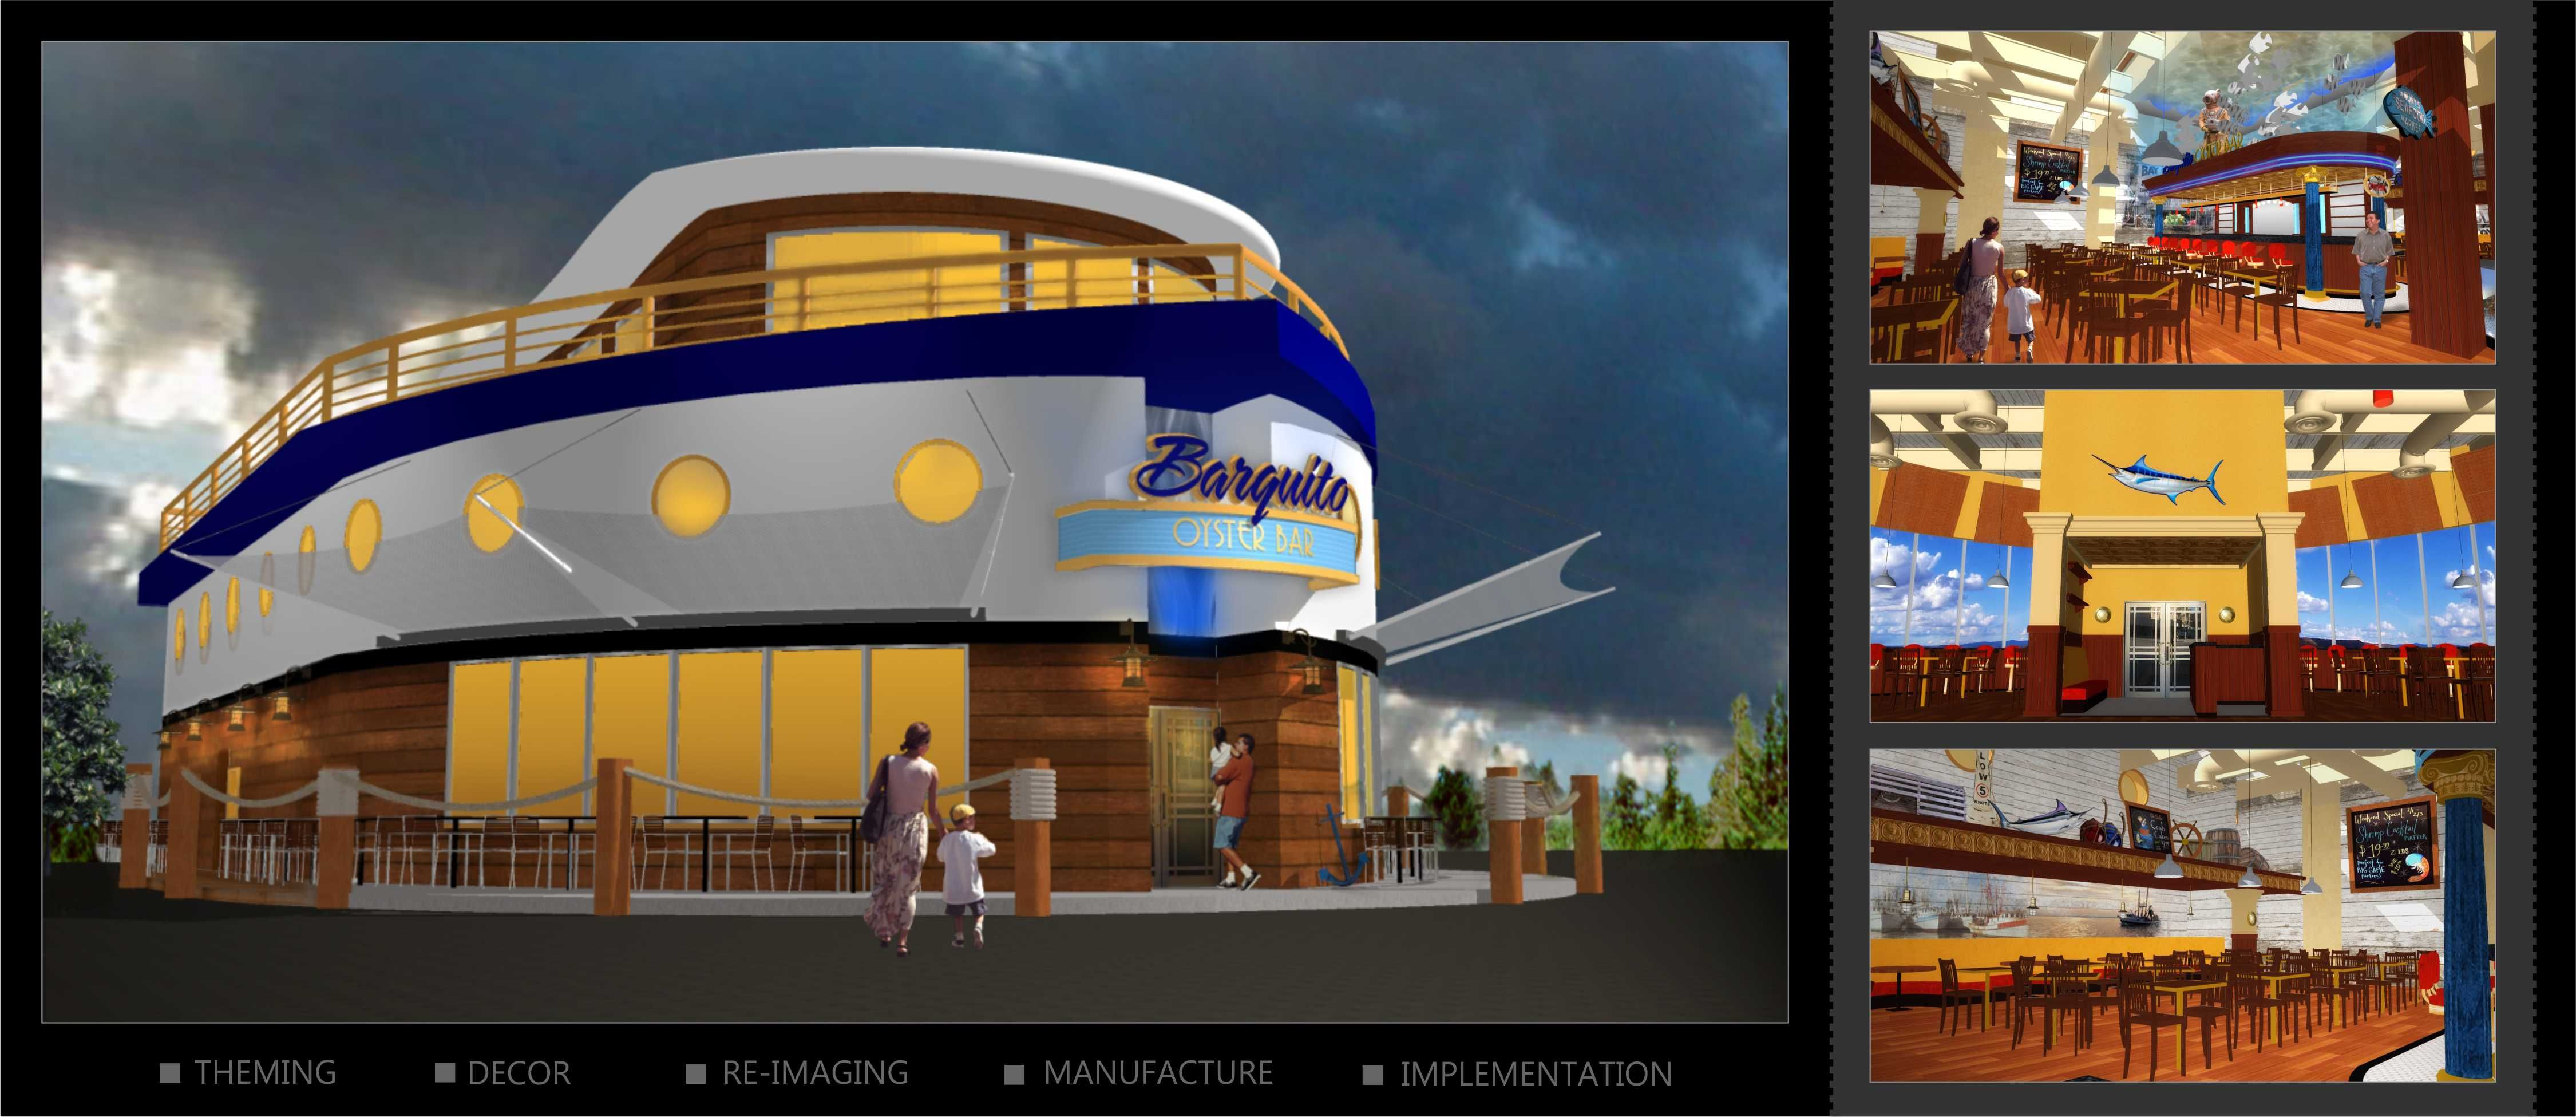 Barquitto Oyster Bar  Restaurant Design Rendering  Wwwi5Designcom